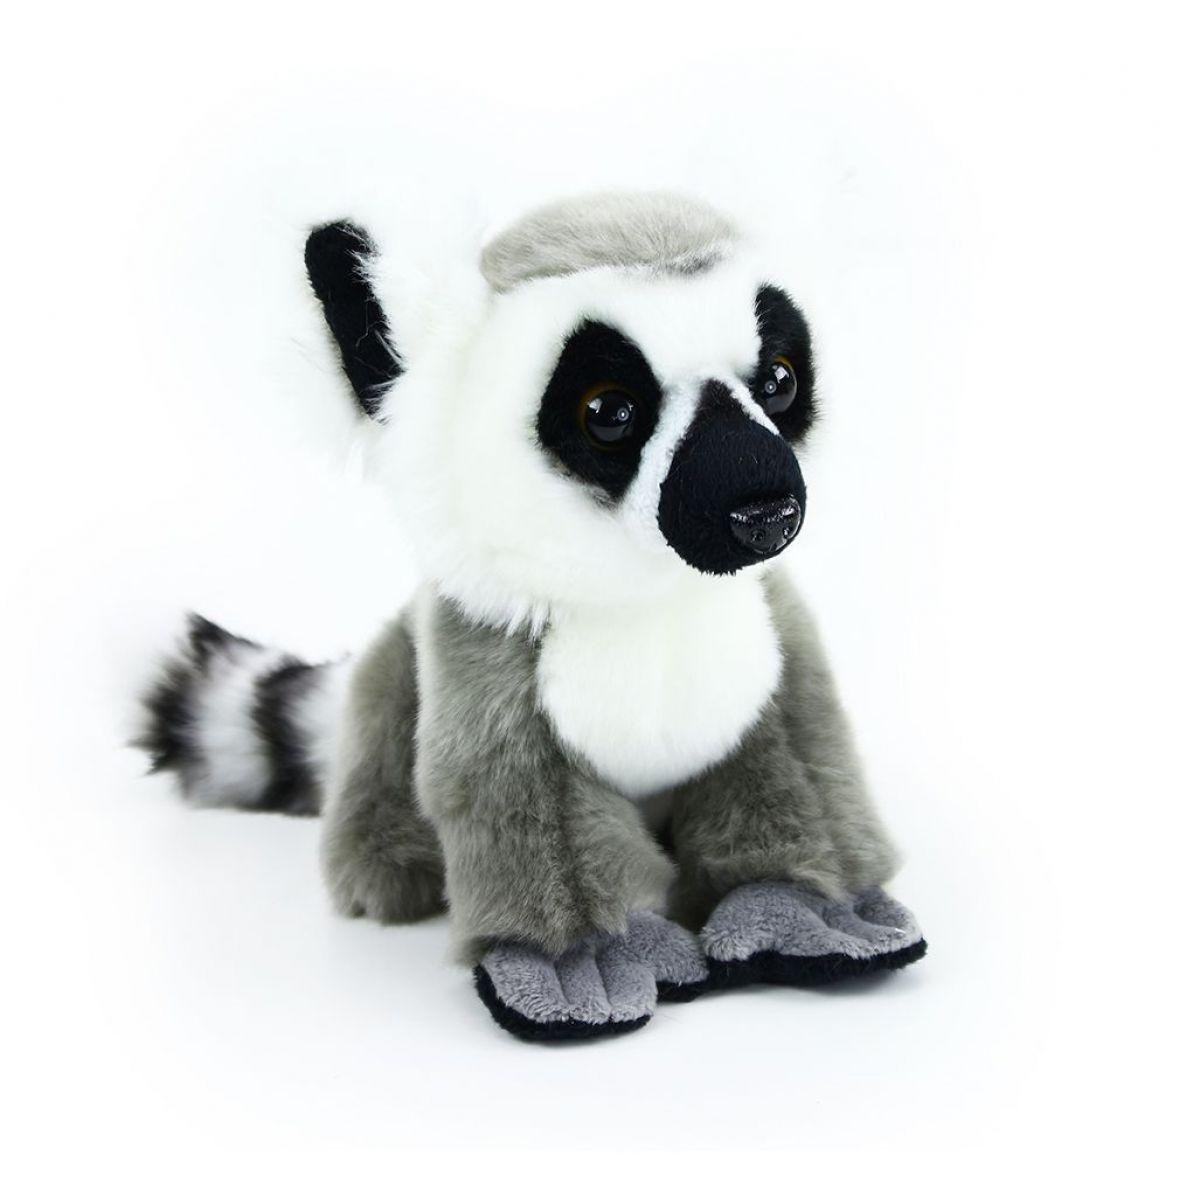 Rappa plyšový lemur sedící 18 cm